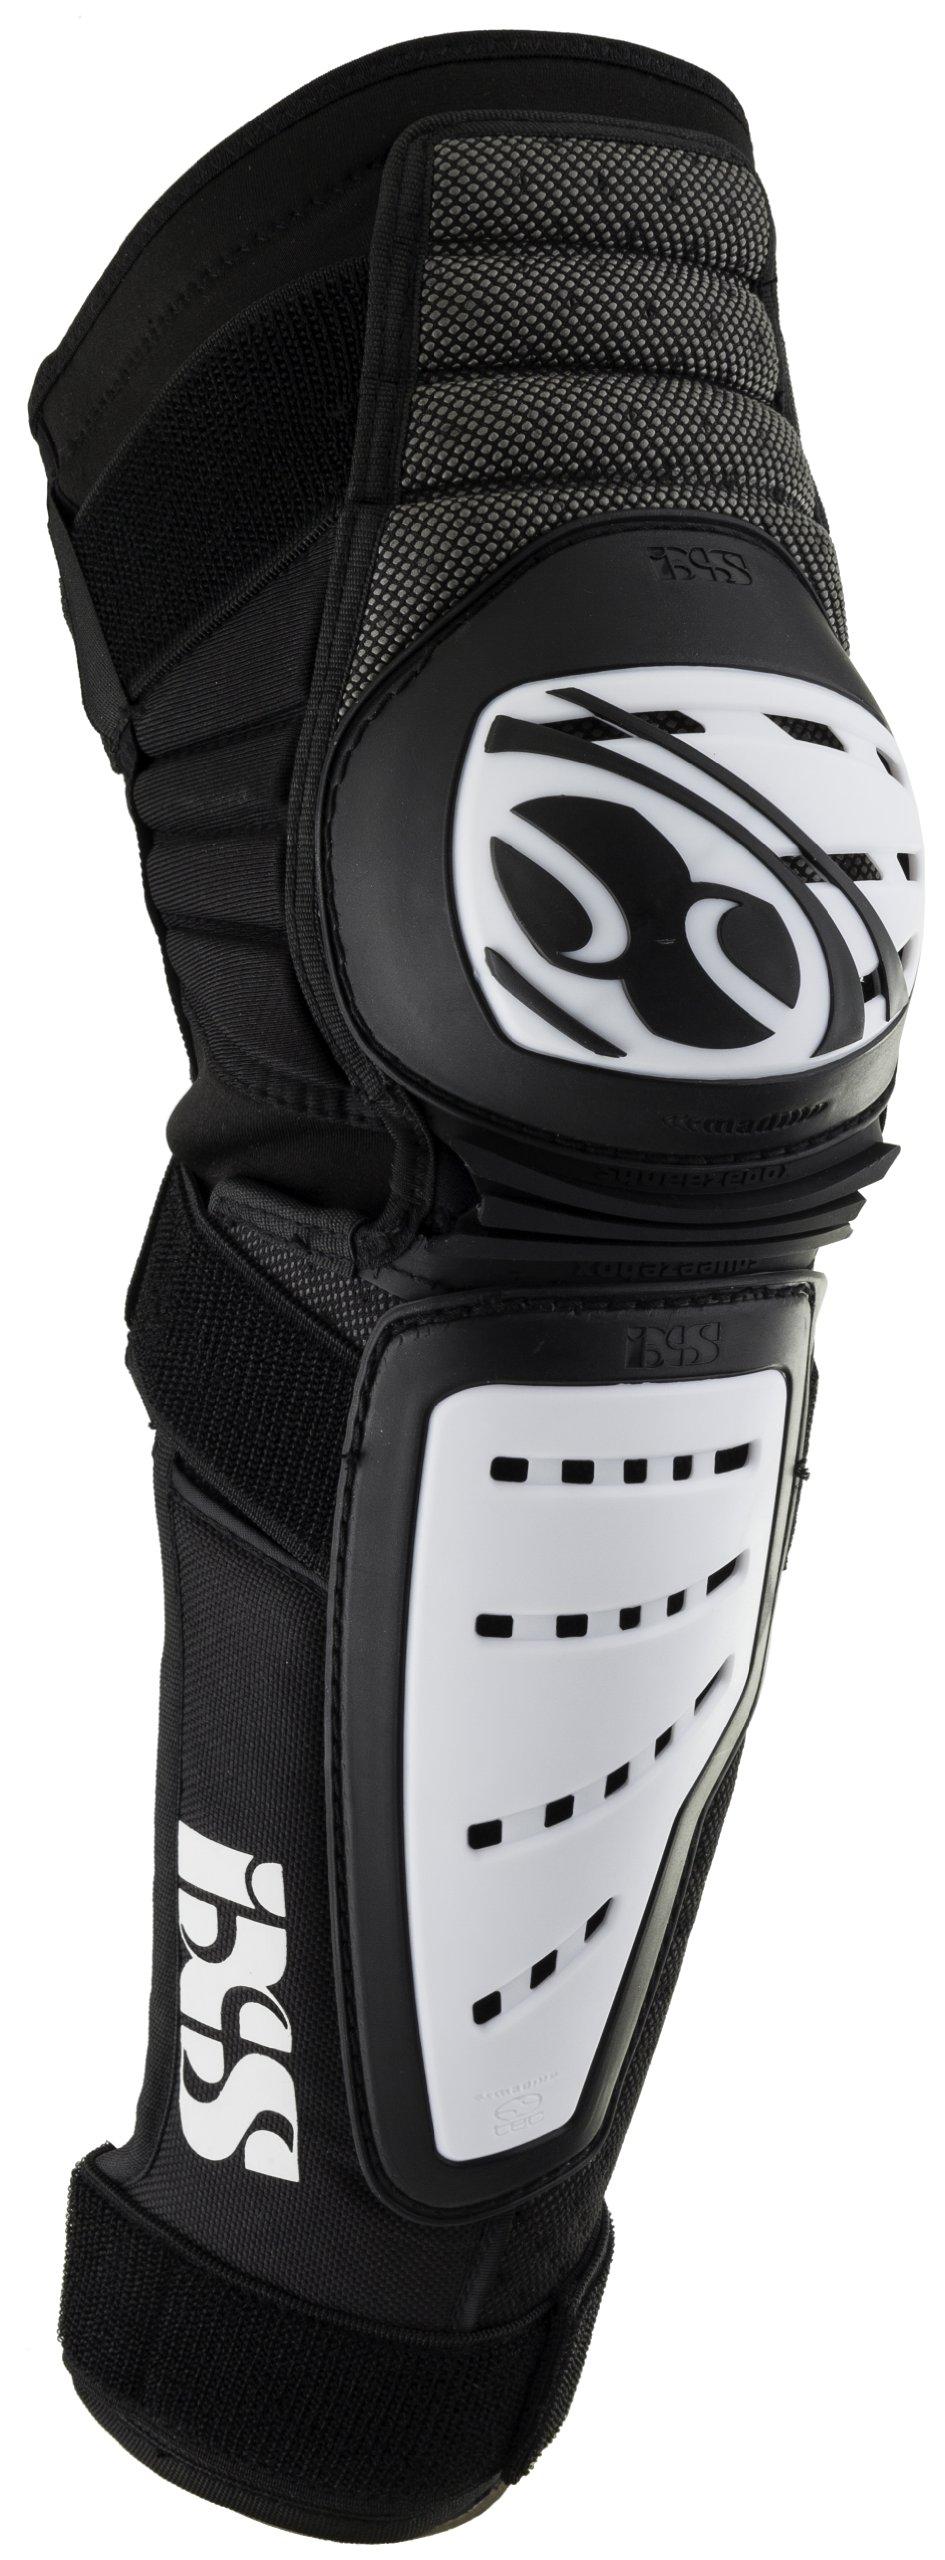 IXS Cleaver Knee/Shin Guards white/black (Size: M) leg protector